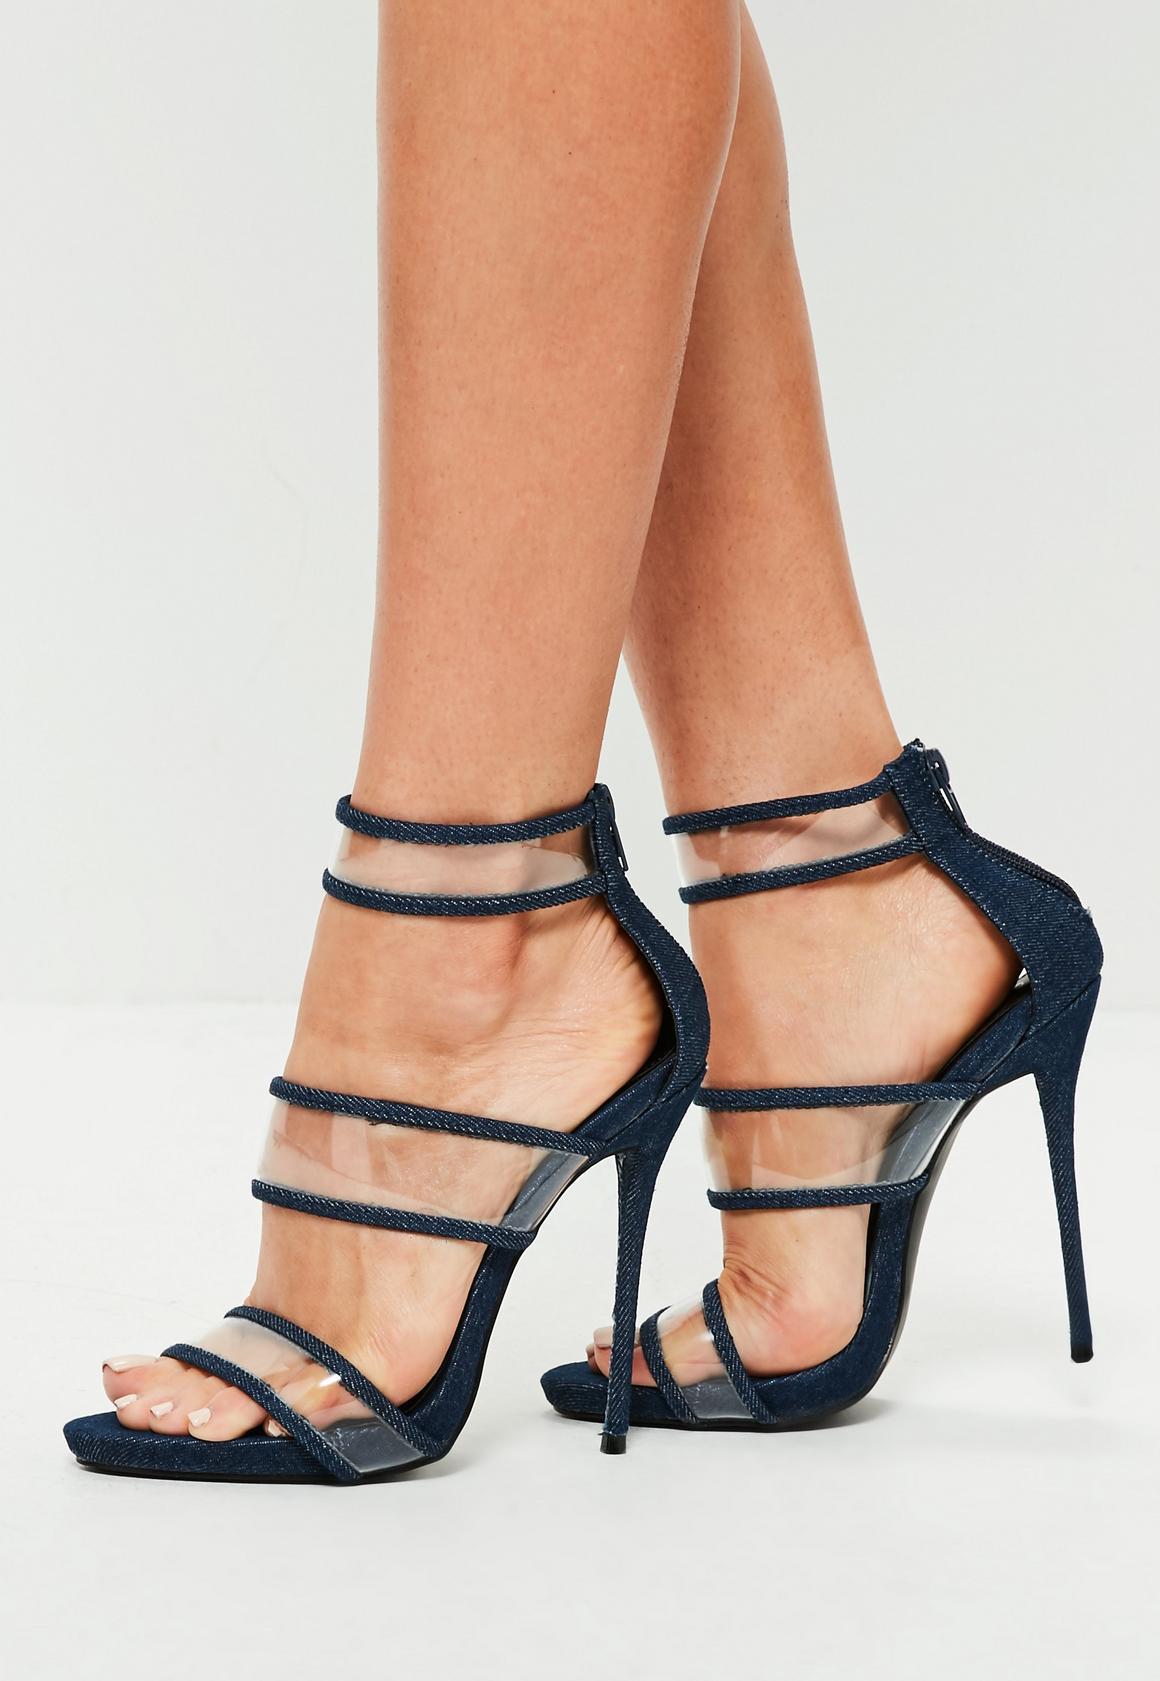 Blue Denim Strappy Clear High Heel Sandals | Missguided